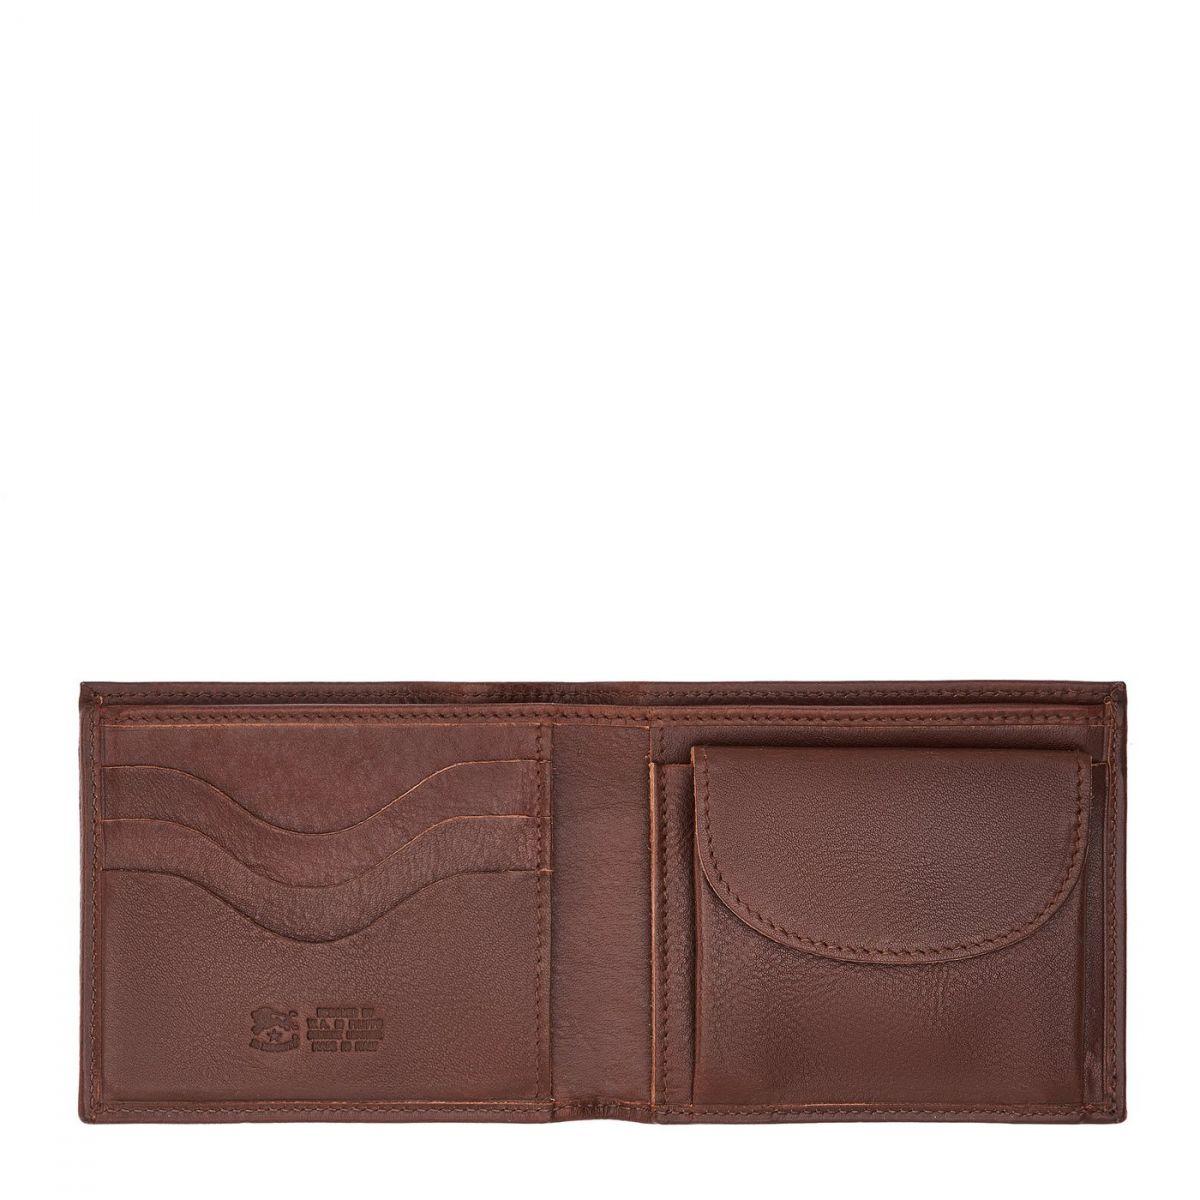 Men's Bi-Fold Wallet  in Cowhide Double Leather SBW023 color Brown | Details